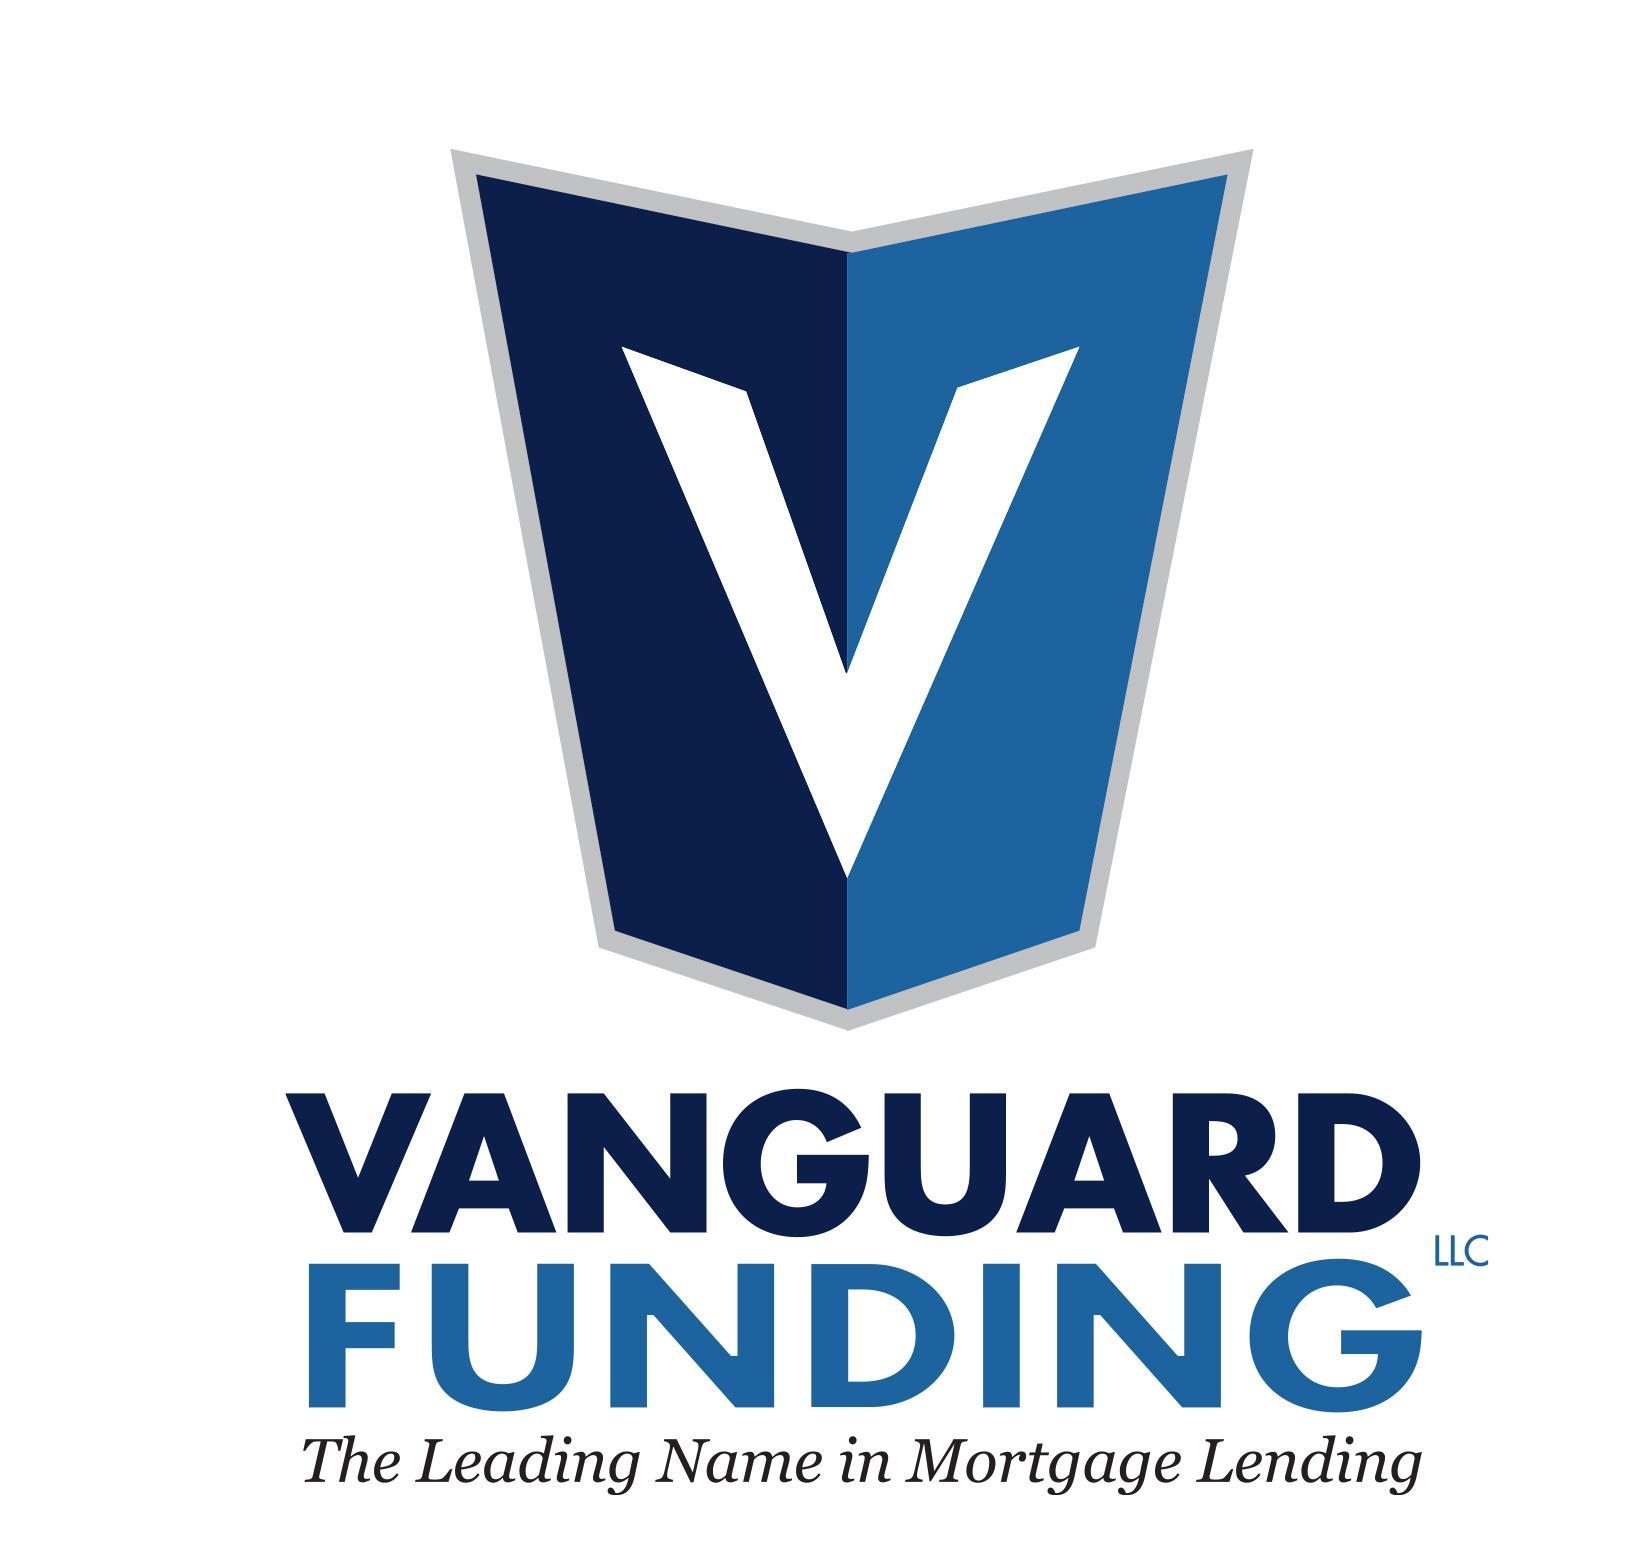 Vanguard funding eric busuttil for 140 broadway 46th floor